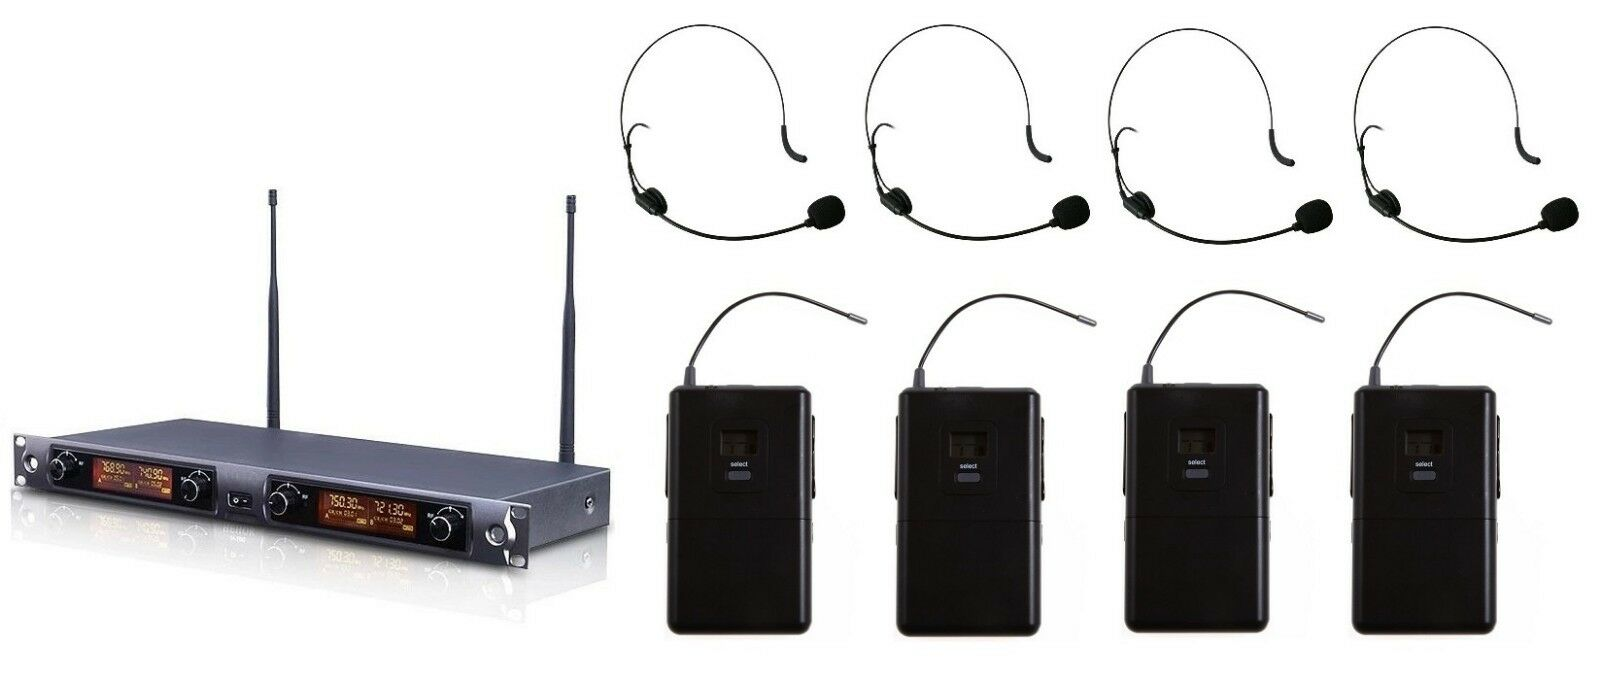 Professional 4 Channel UHF Headset Wireless Microphone System Mic (Marke Neu)